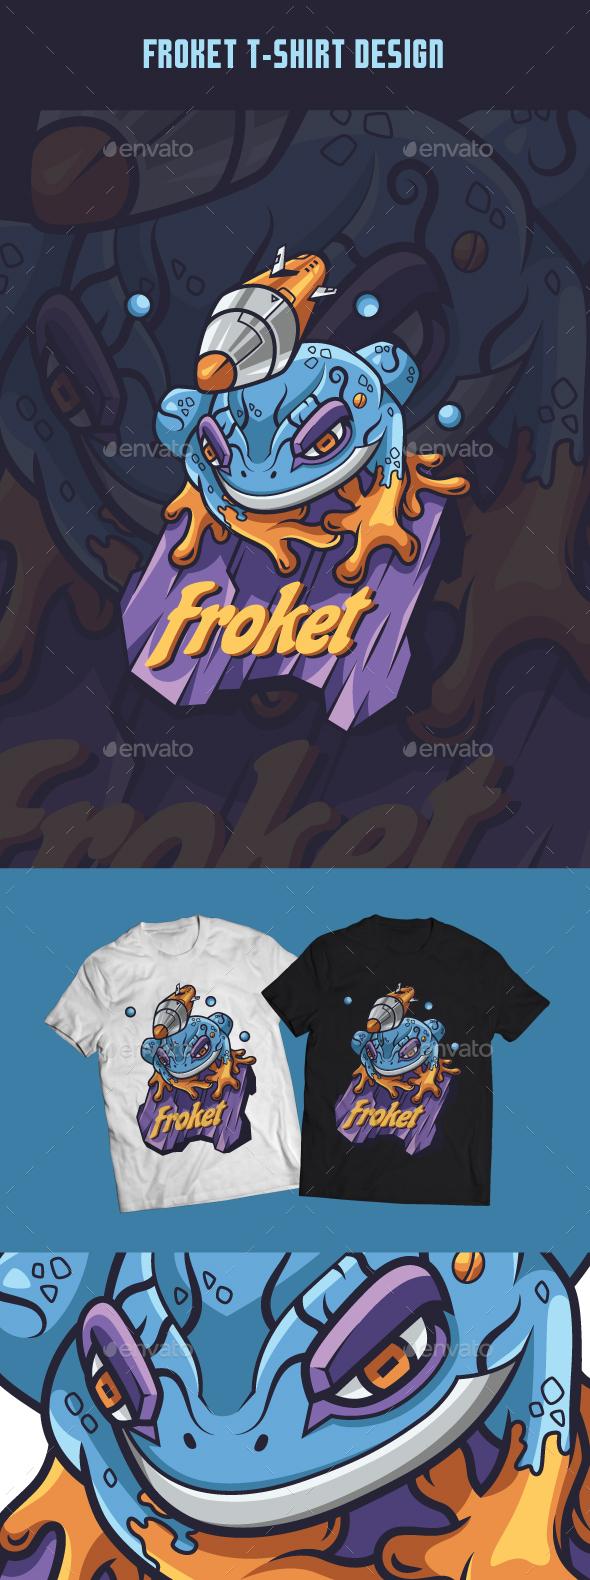 Froket T-Shirt Design